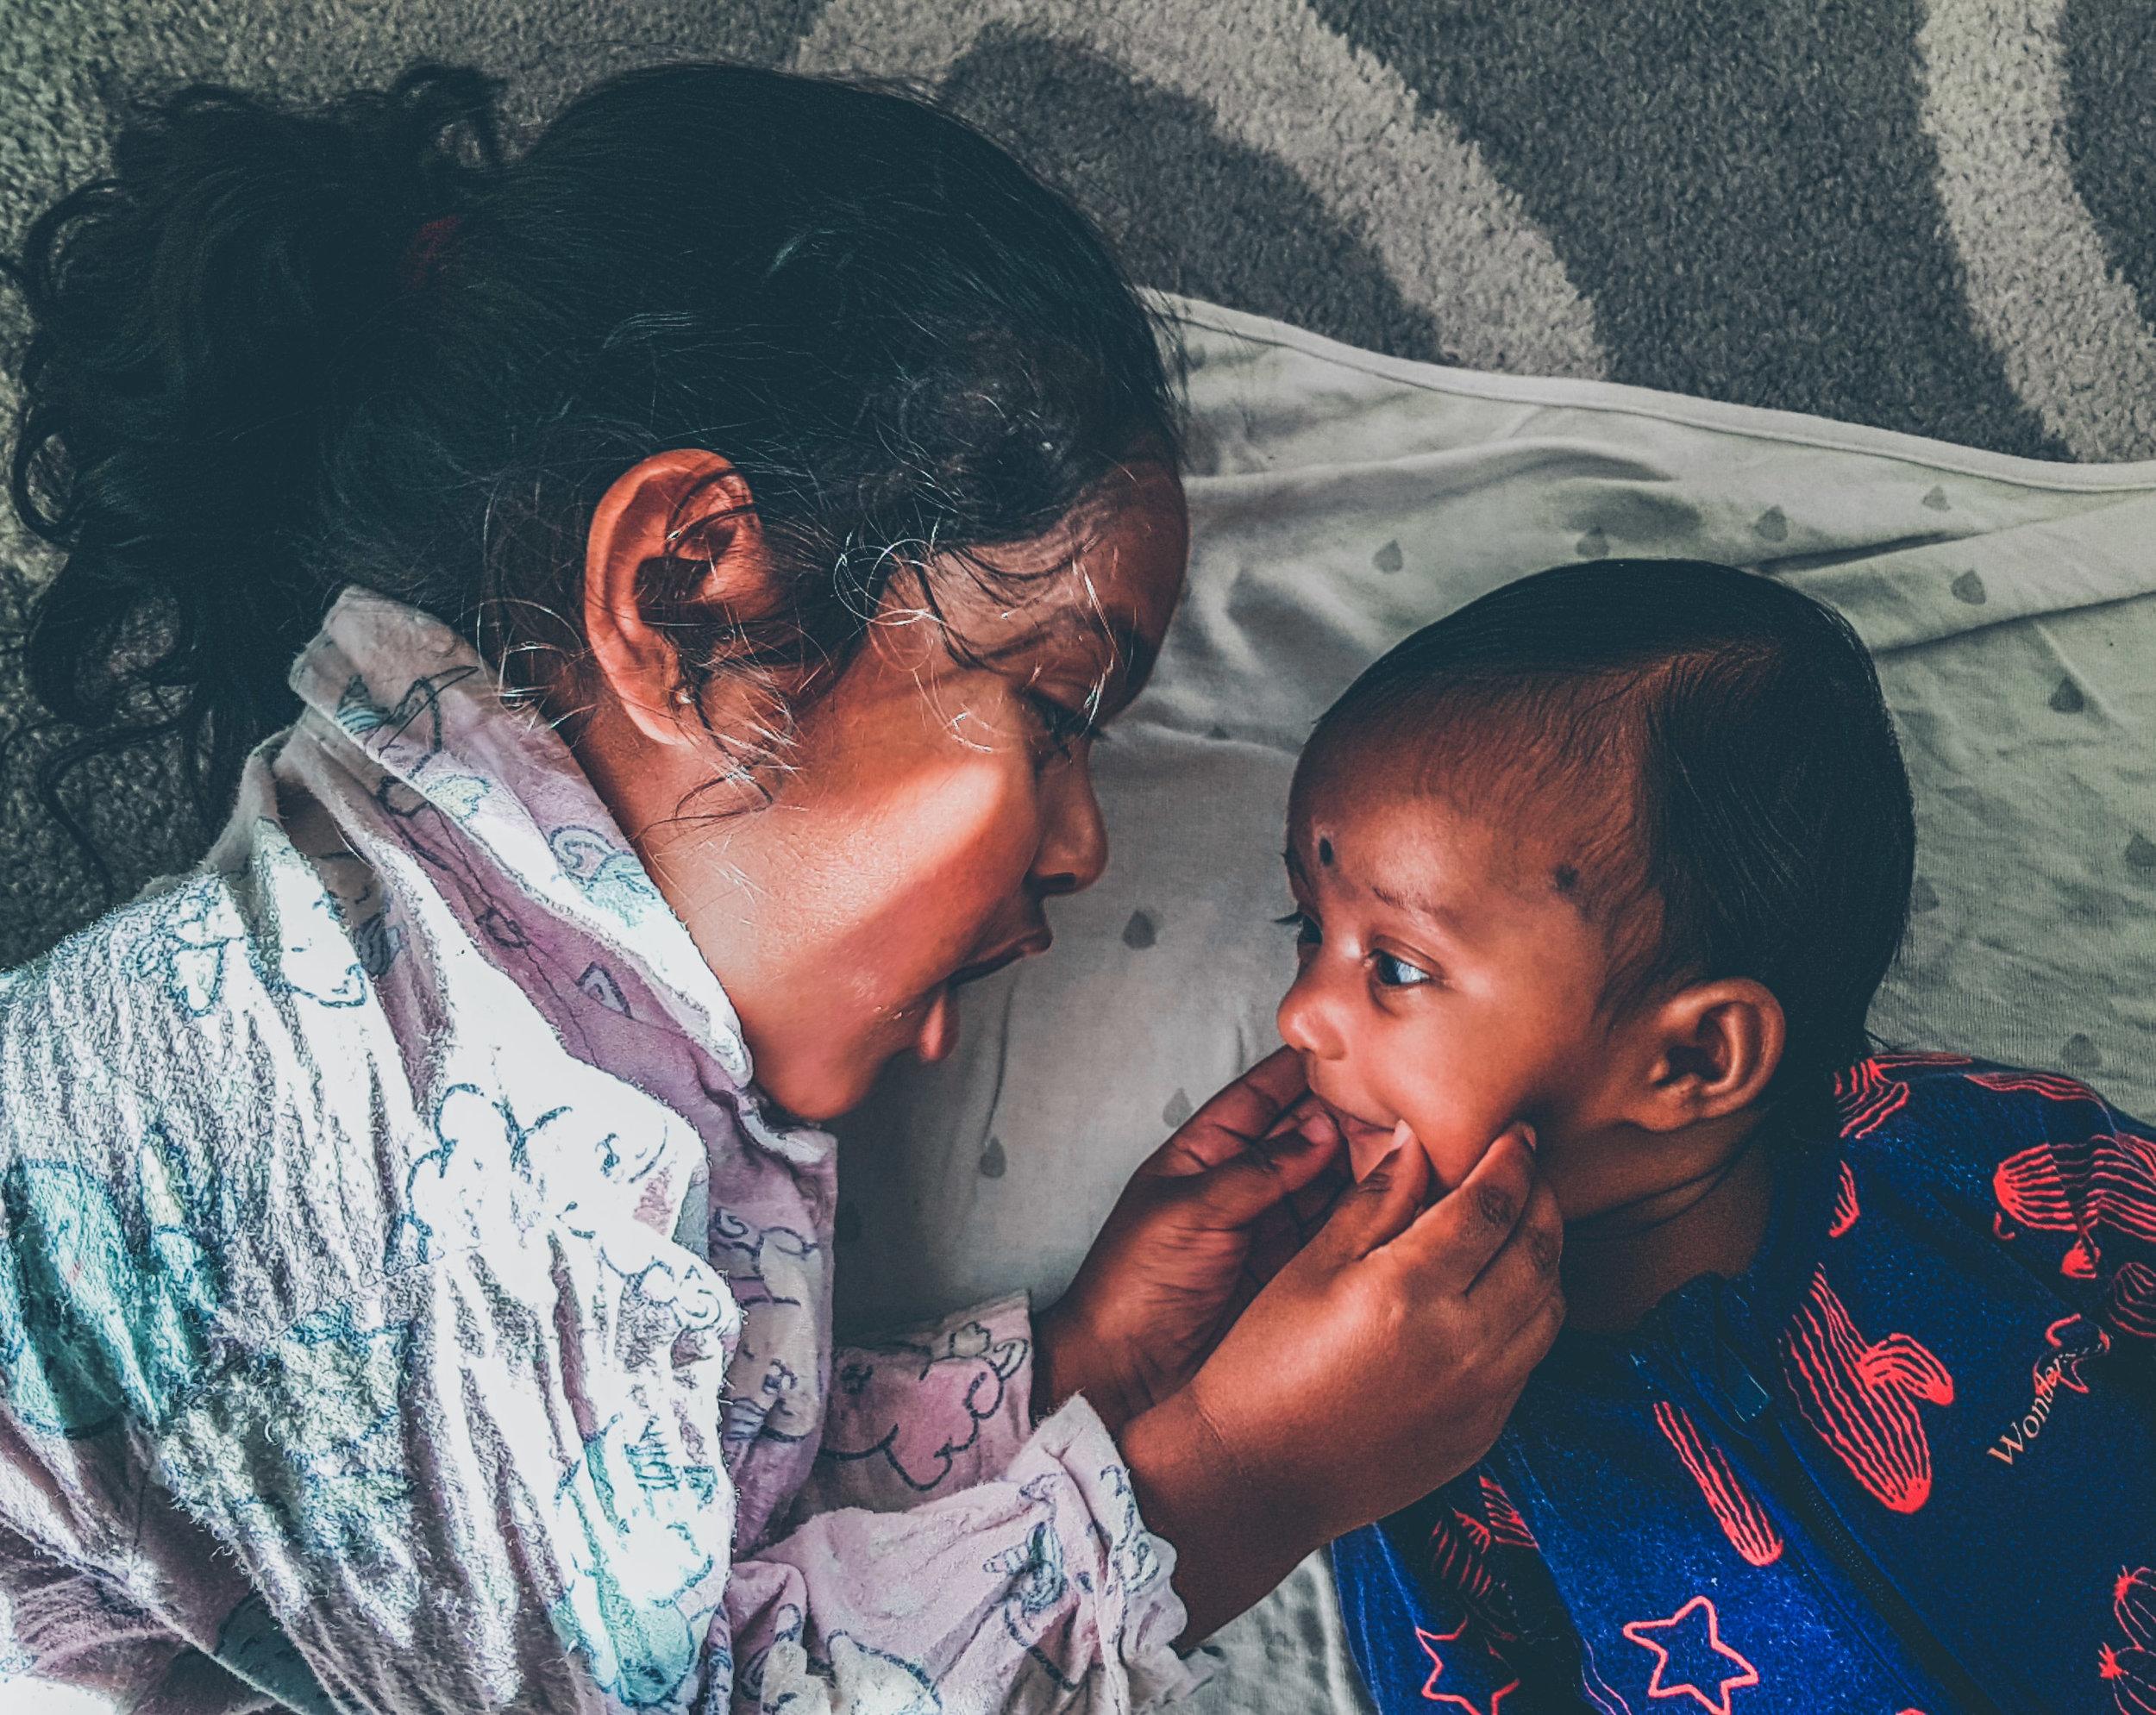 The Sibling Bond by Anirudh Koppula